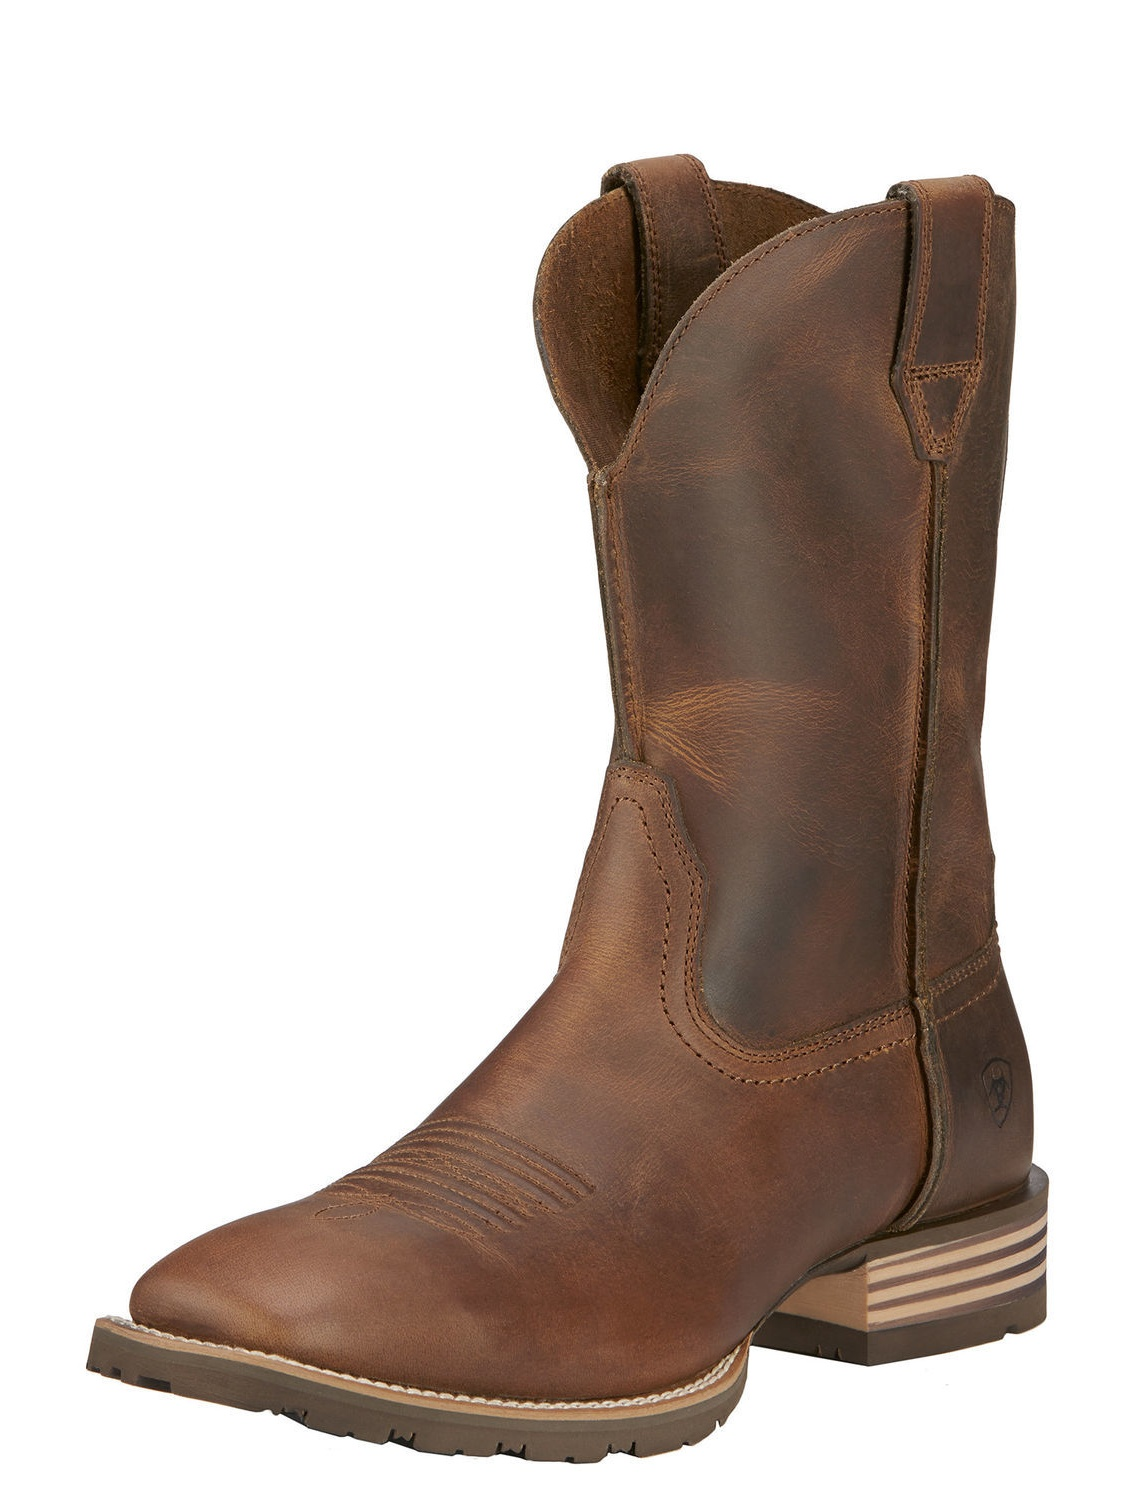 Ariat Men's Hybrid Street Side Cowboy Boot Square Toe - 10016290